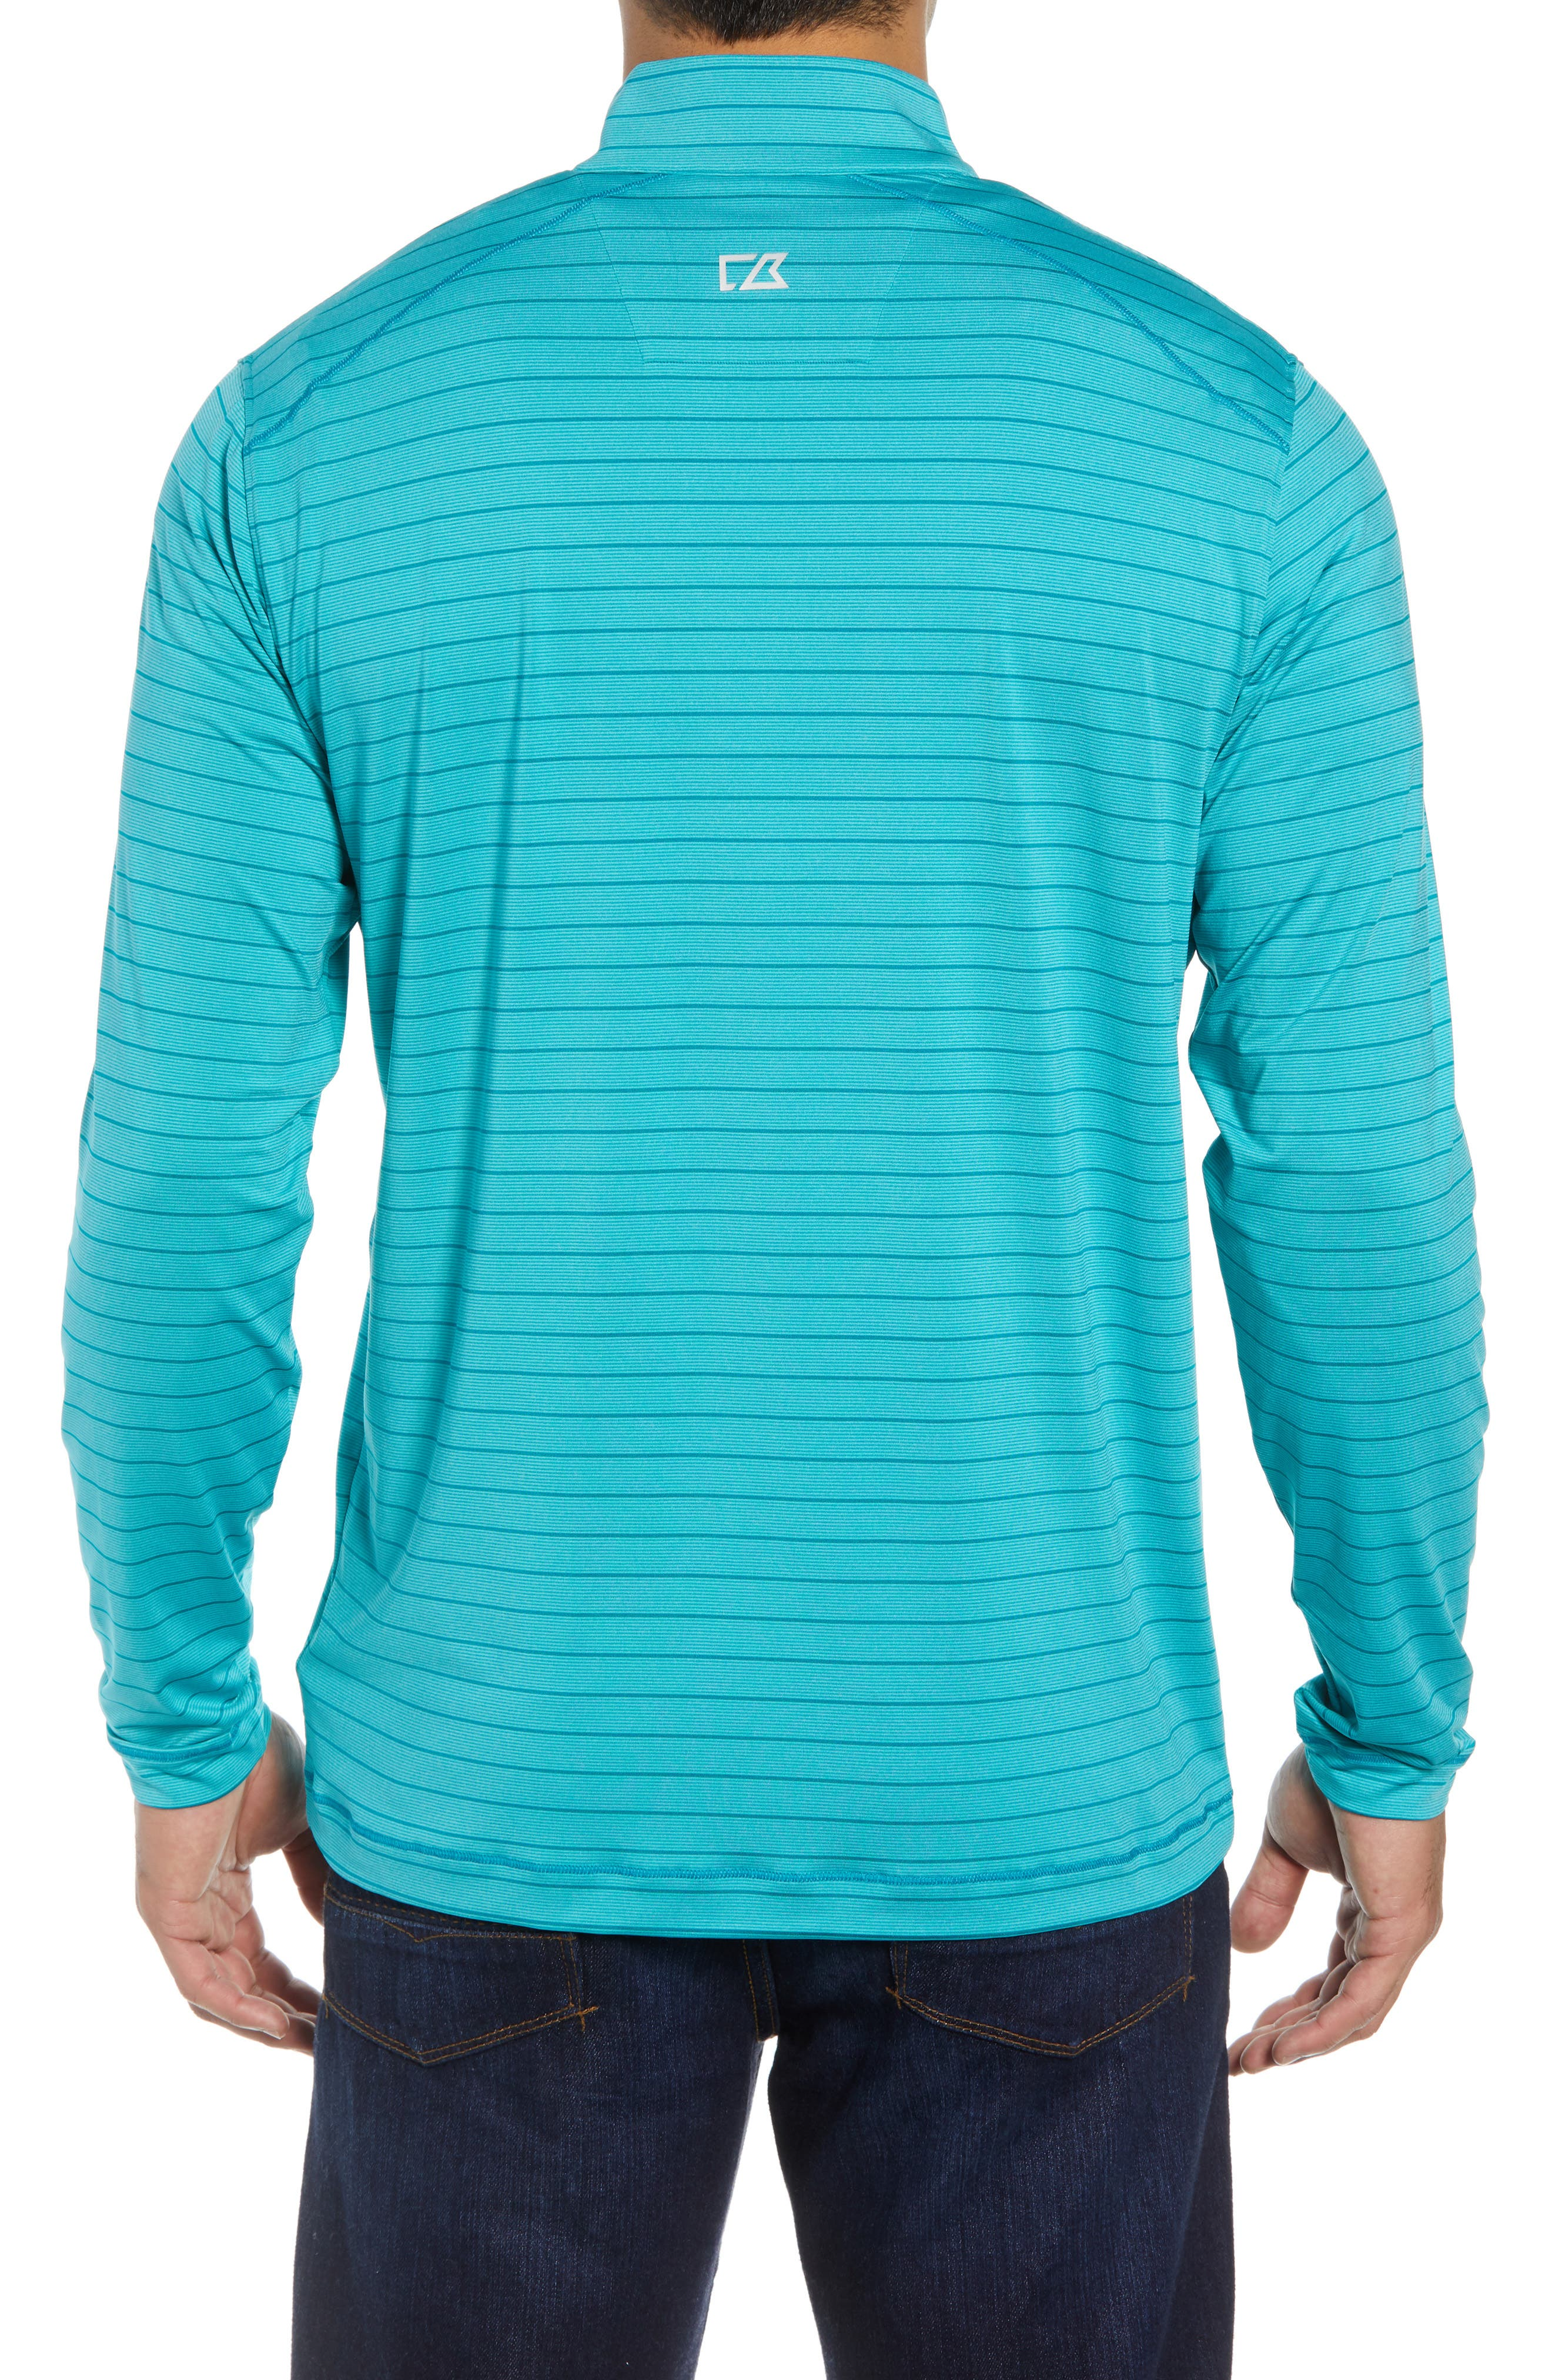 Holman Stripe Half Zip Pullover,                             Alternate thumbnail 2, color,                             AQUATIC HEATHER